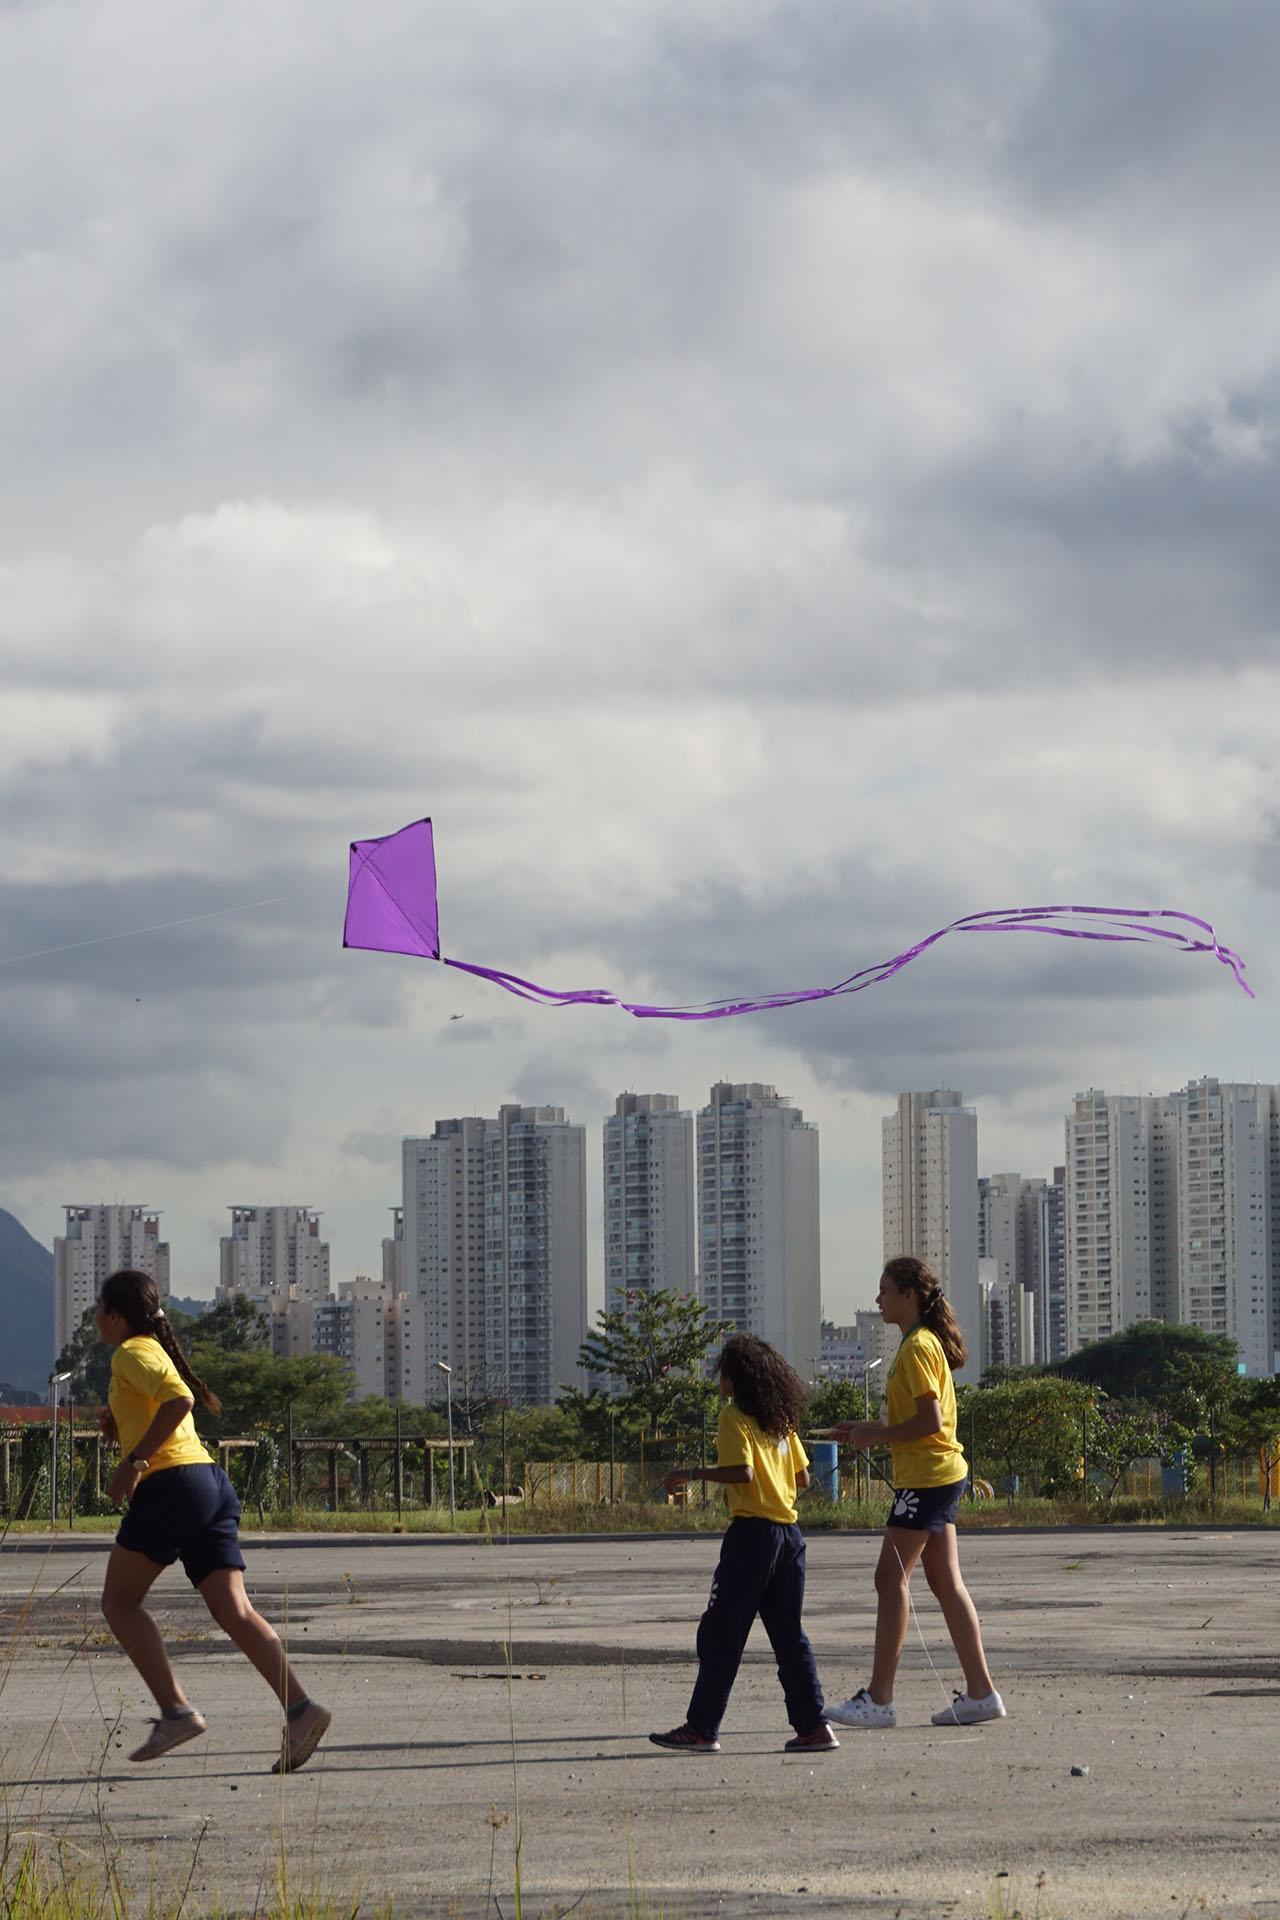 Pipa Vista. Urban Intervention, 2019. Instituto Acaia, São Paulo, SP, Brazil. Photo: Assocreation.